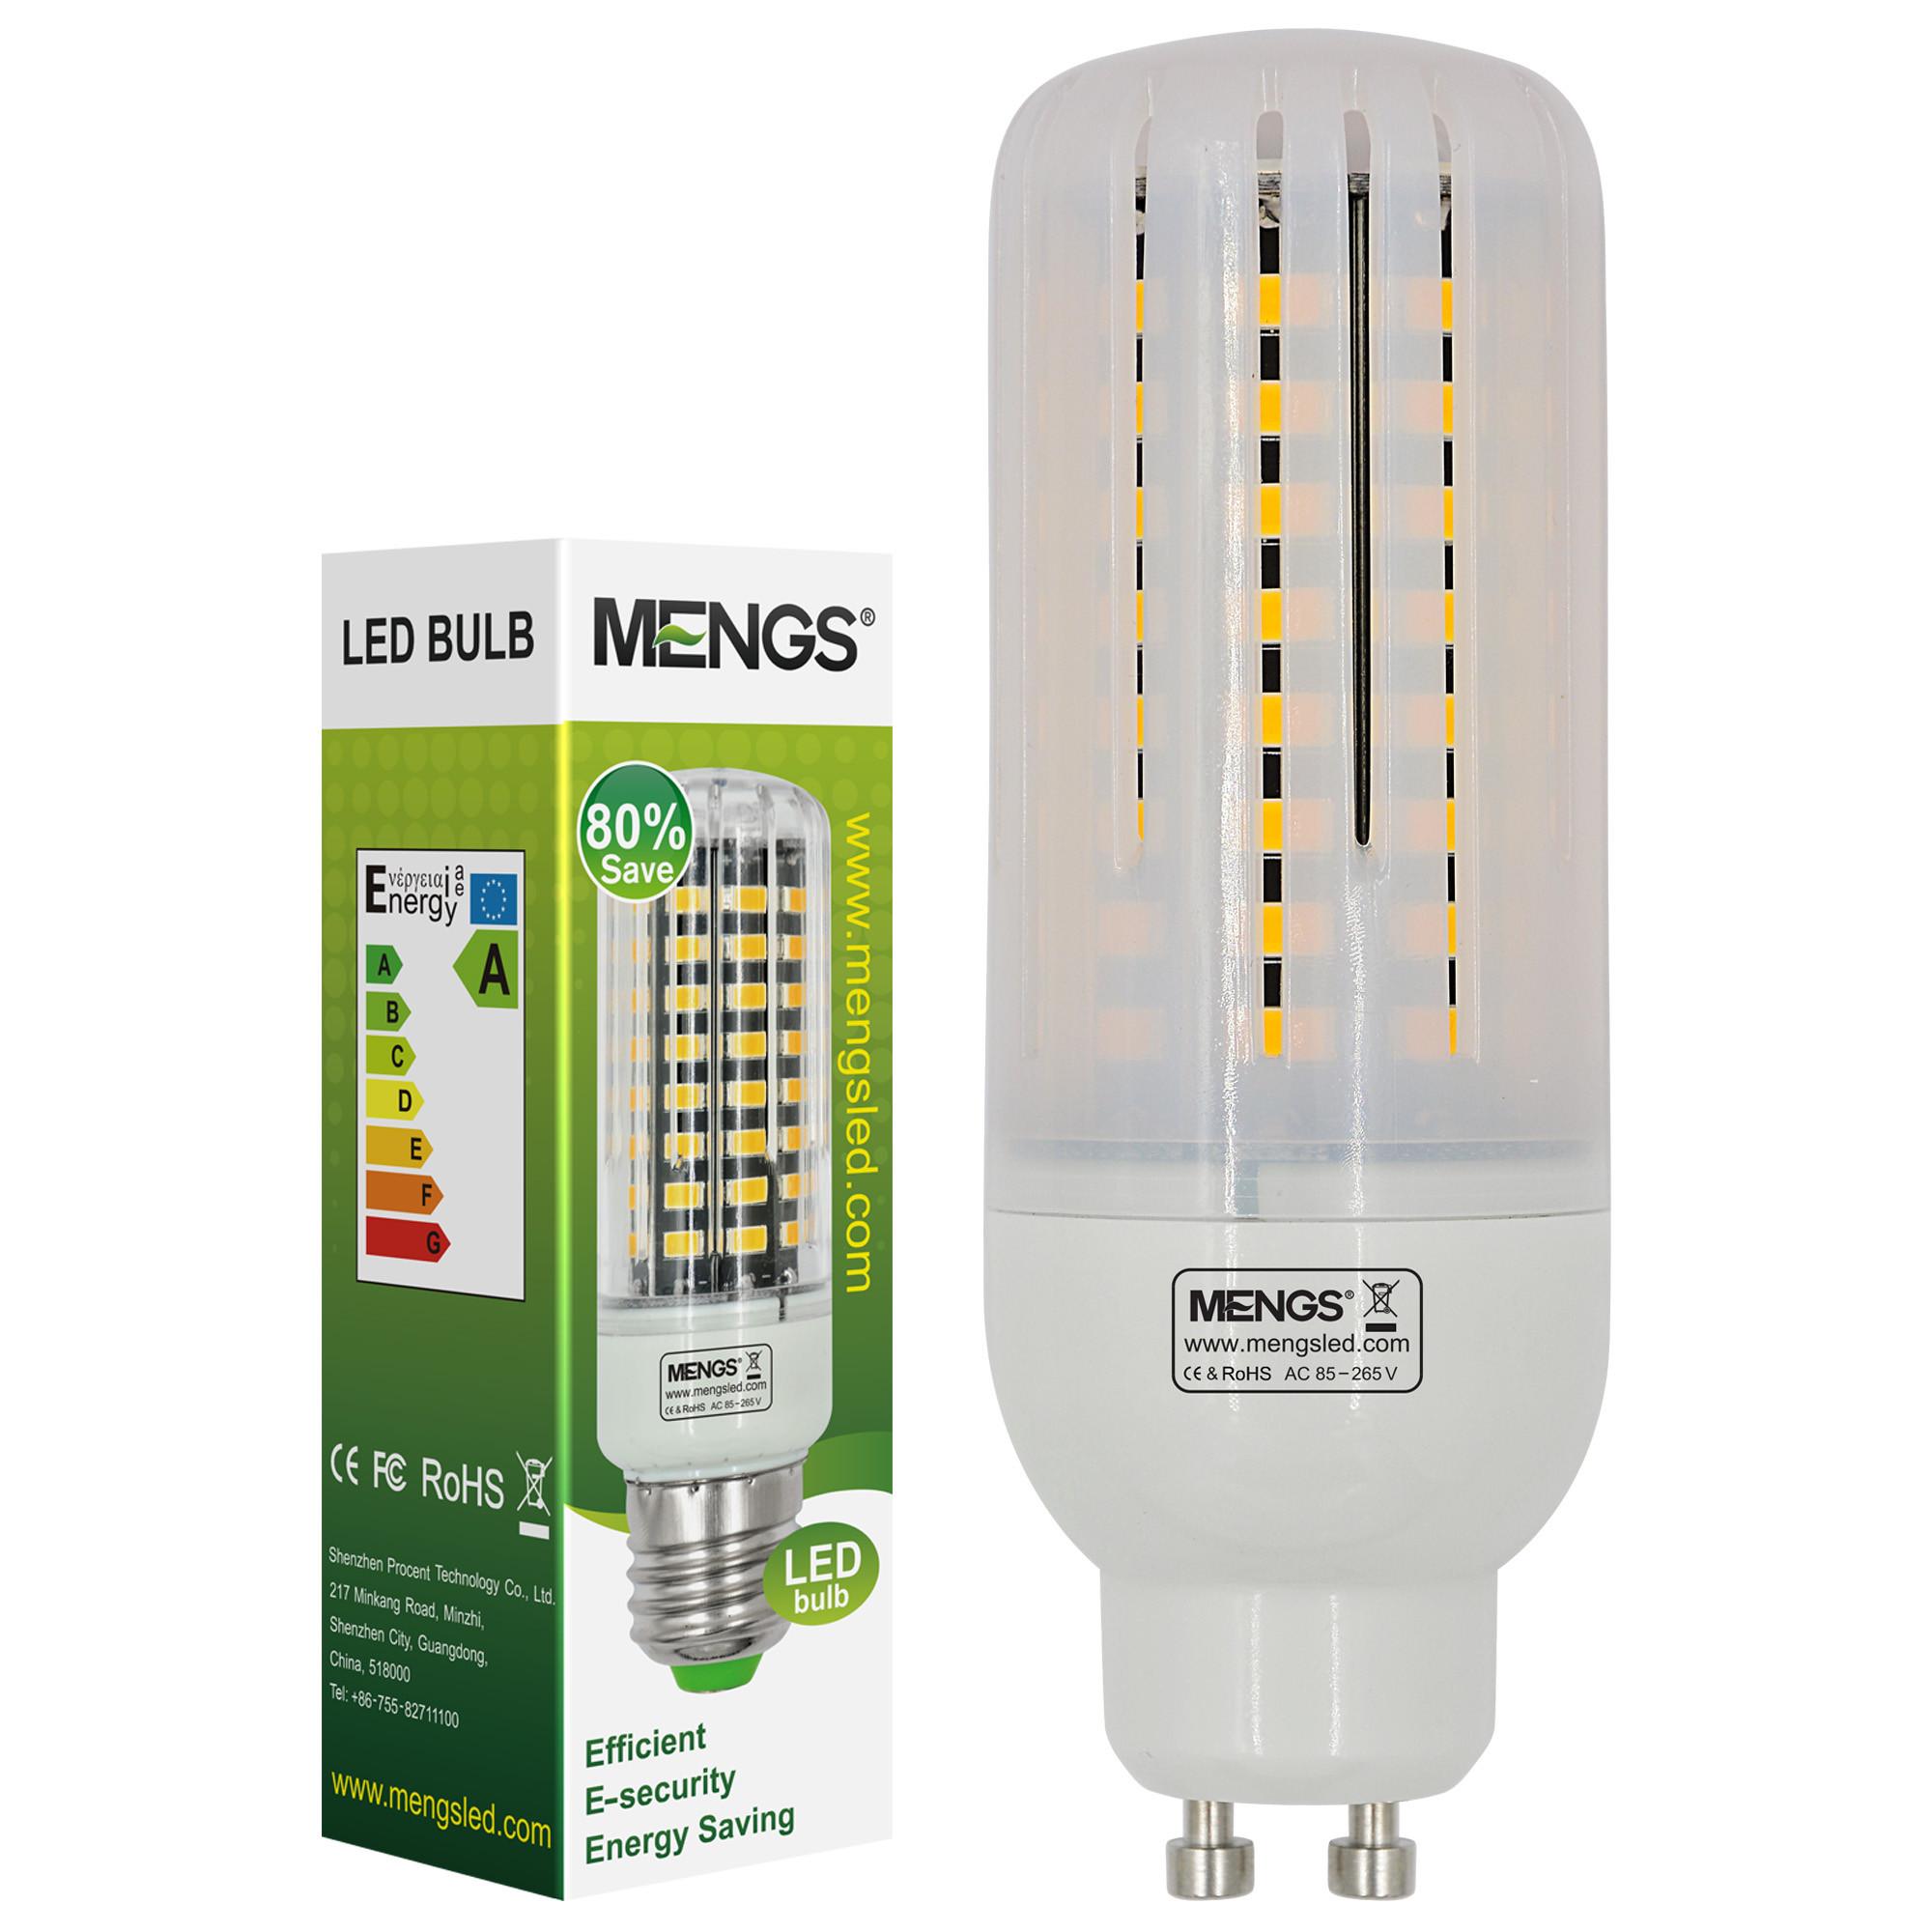 MENGS® Anti-Strobe GU10 9W LED Corn Light 72x 5736 SMD LB LED Bulb Lamp In Cool White Energy-Saving Lamp